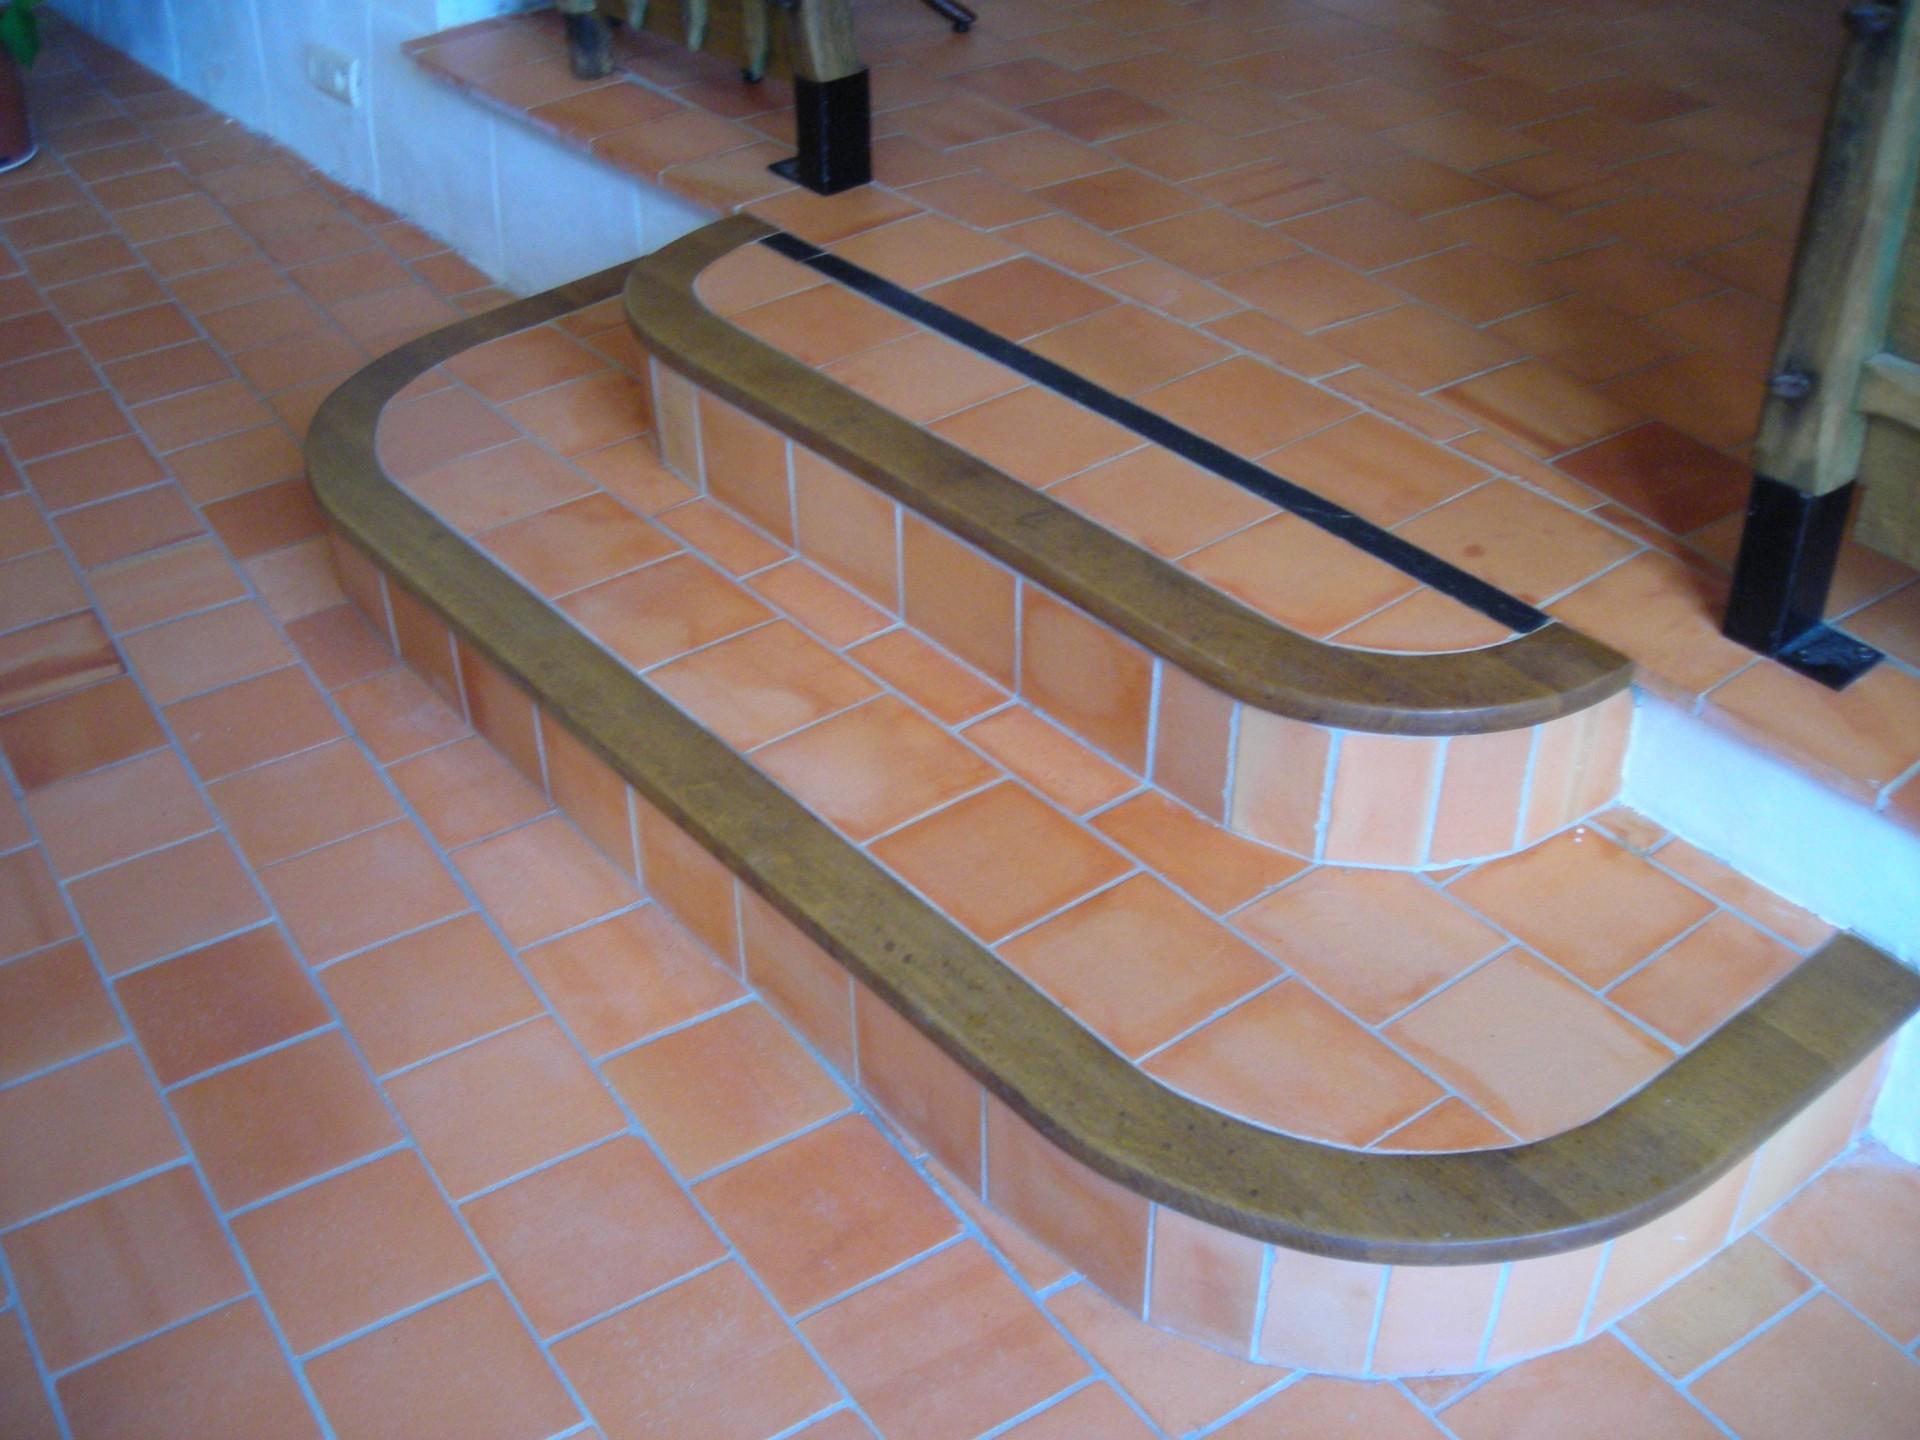 Carrelage design maine carrelage moderne design pour for Ambiance pierre et carrelage